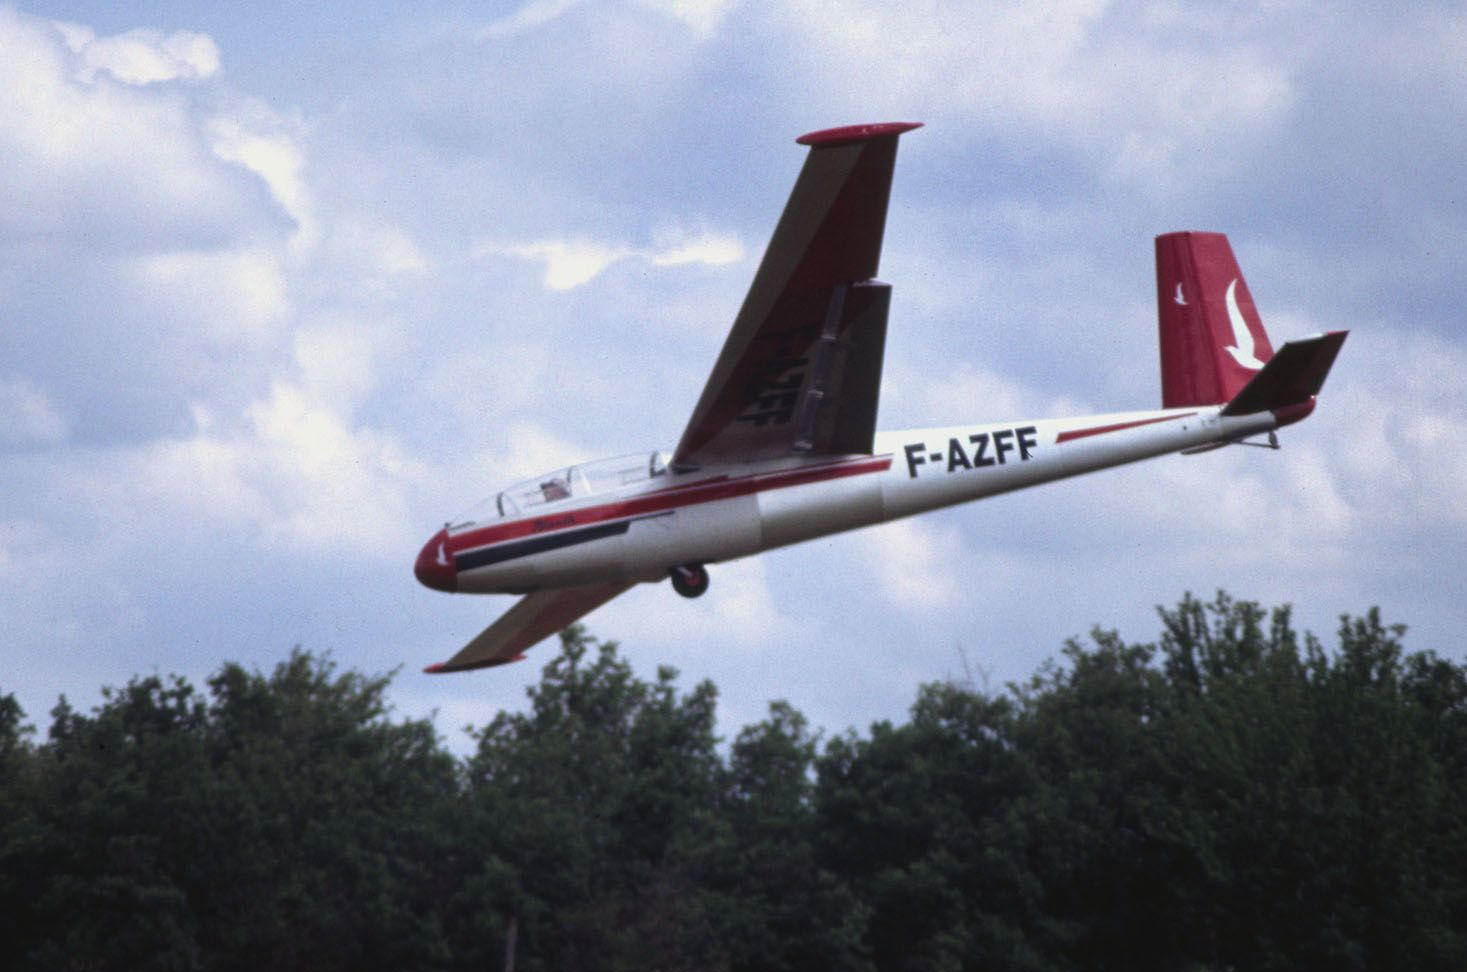 Le Let L-13 Blanik F-AZFF